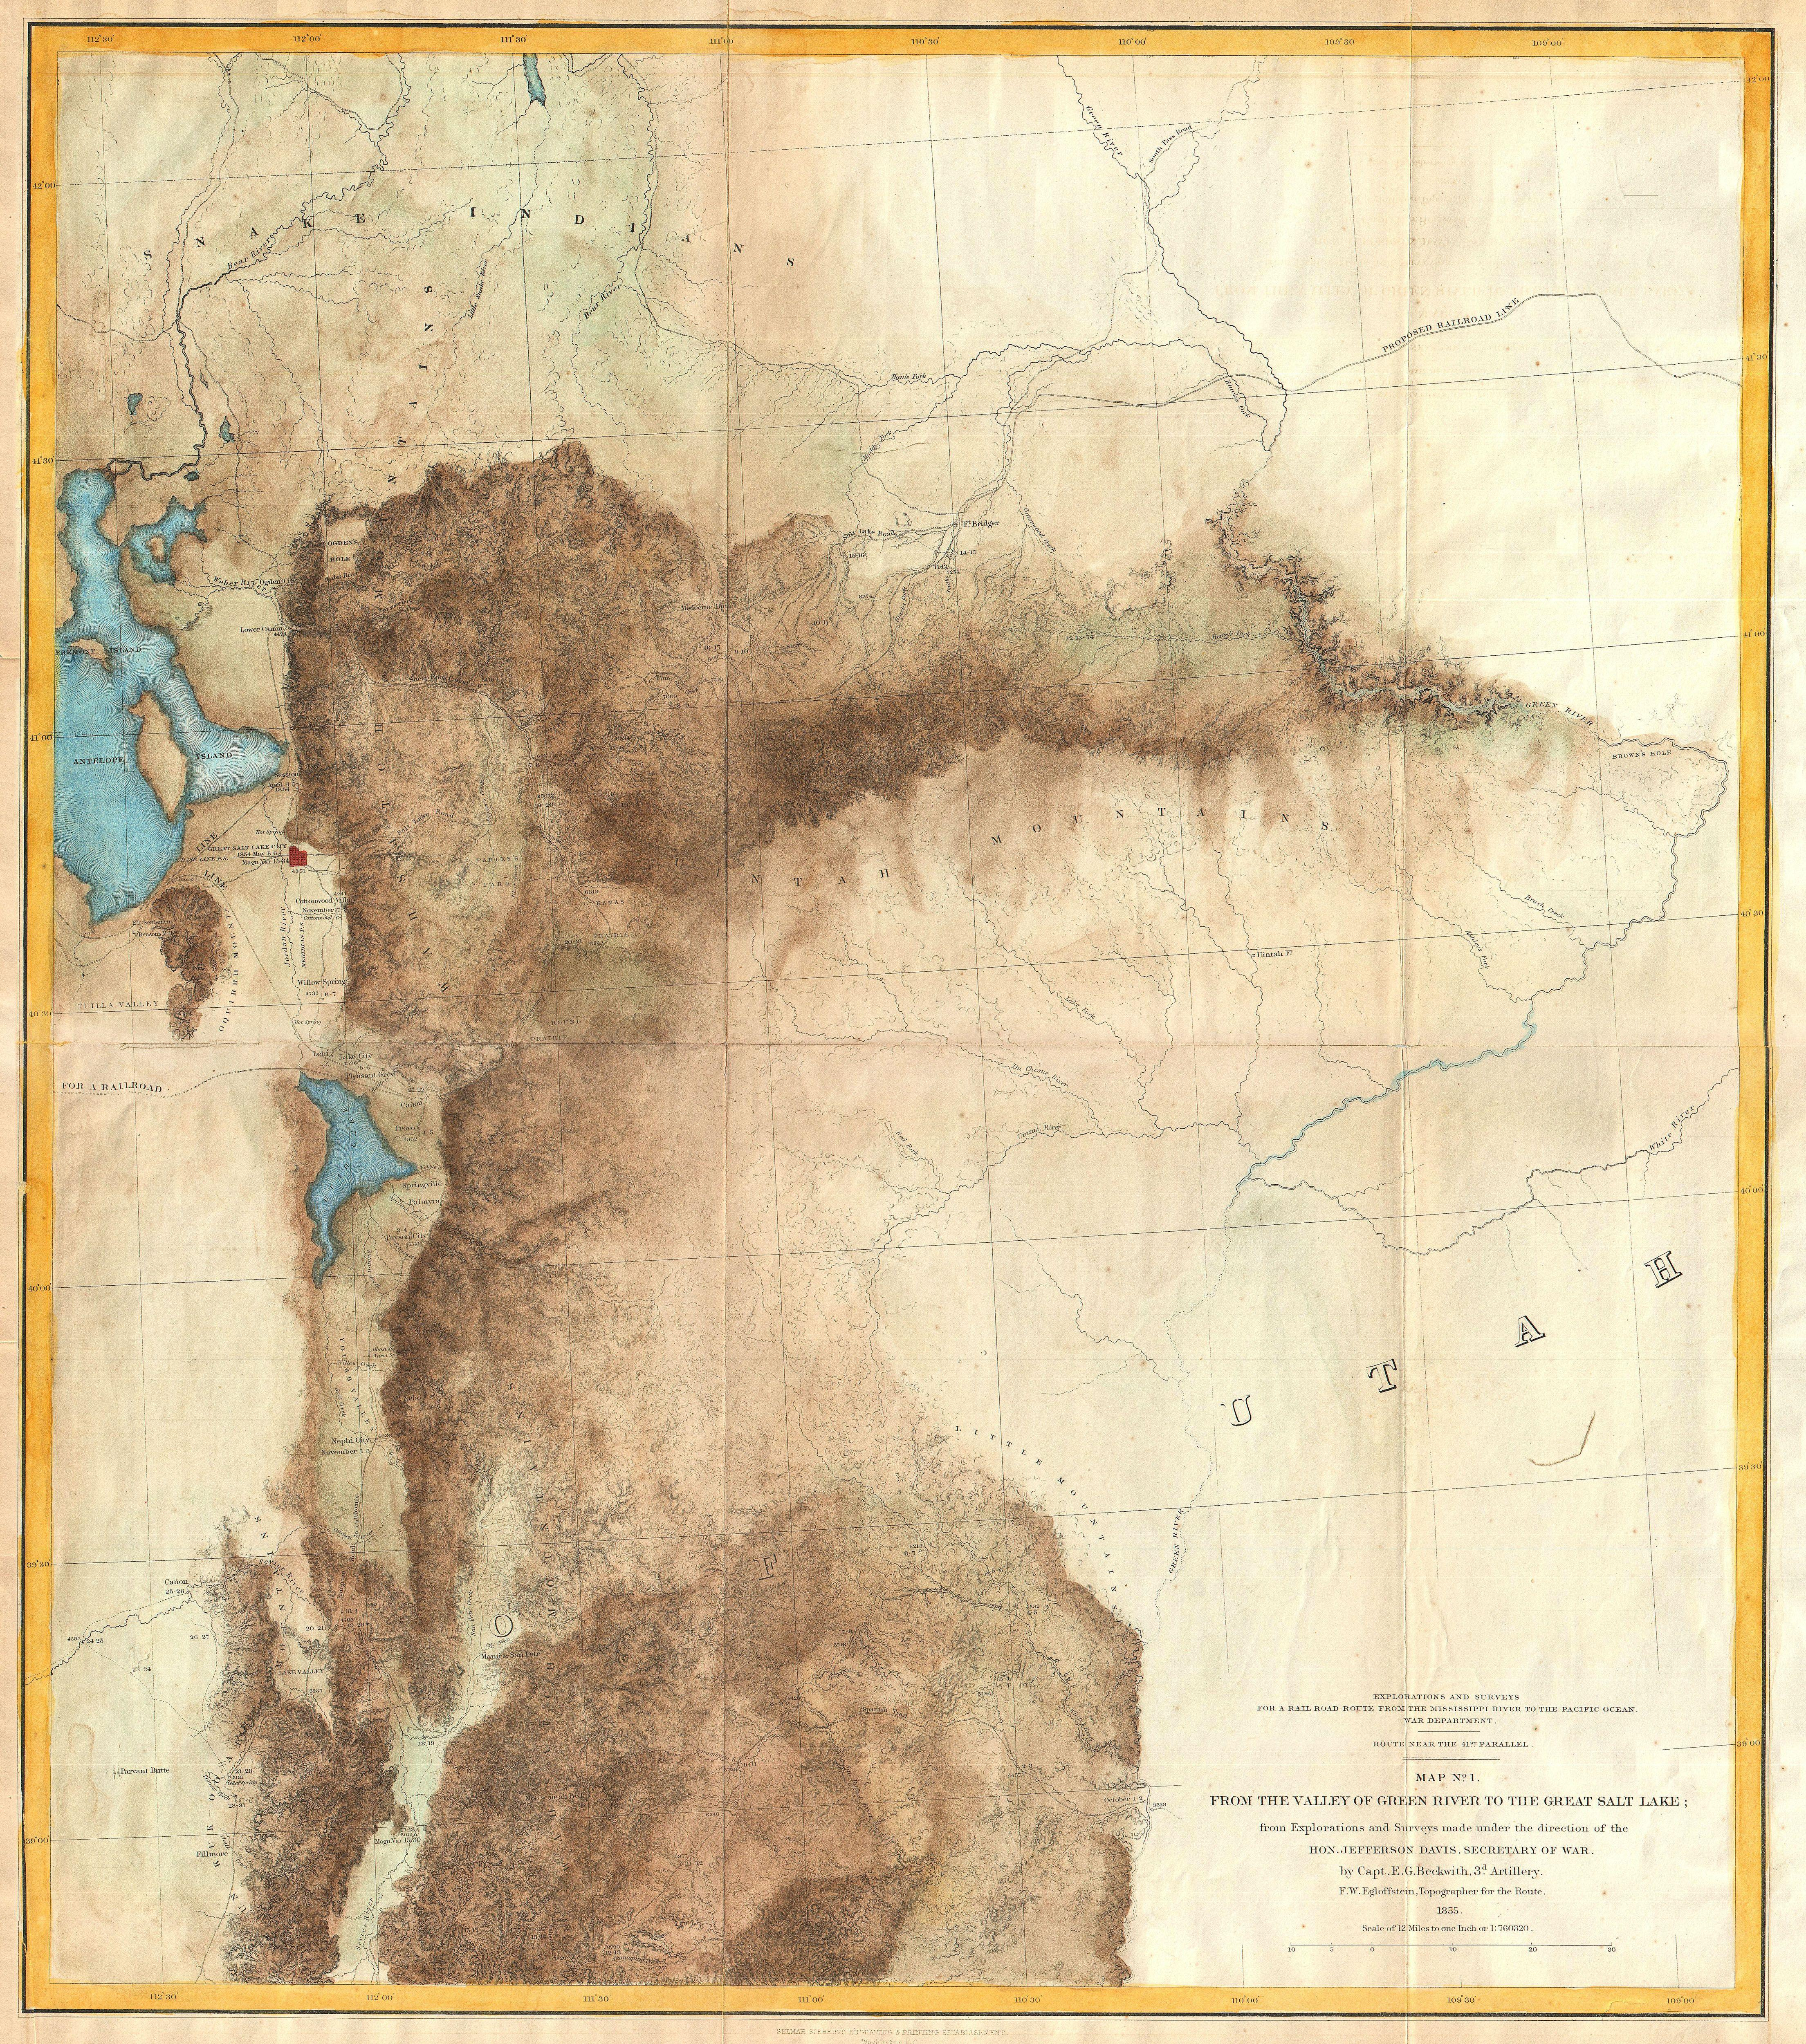 Gren River Utah To Salt Lake City